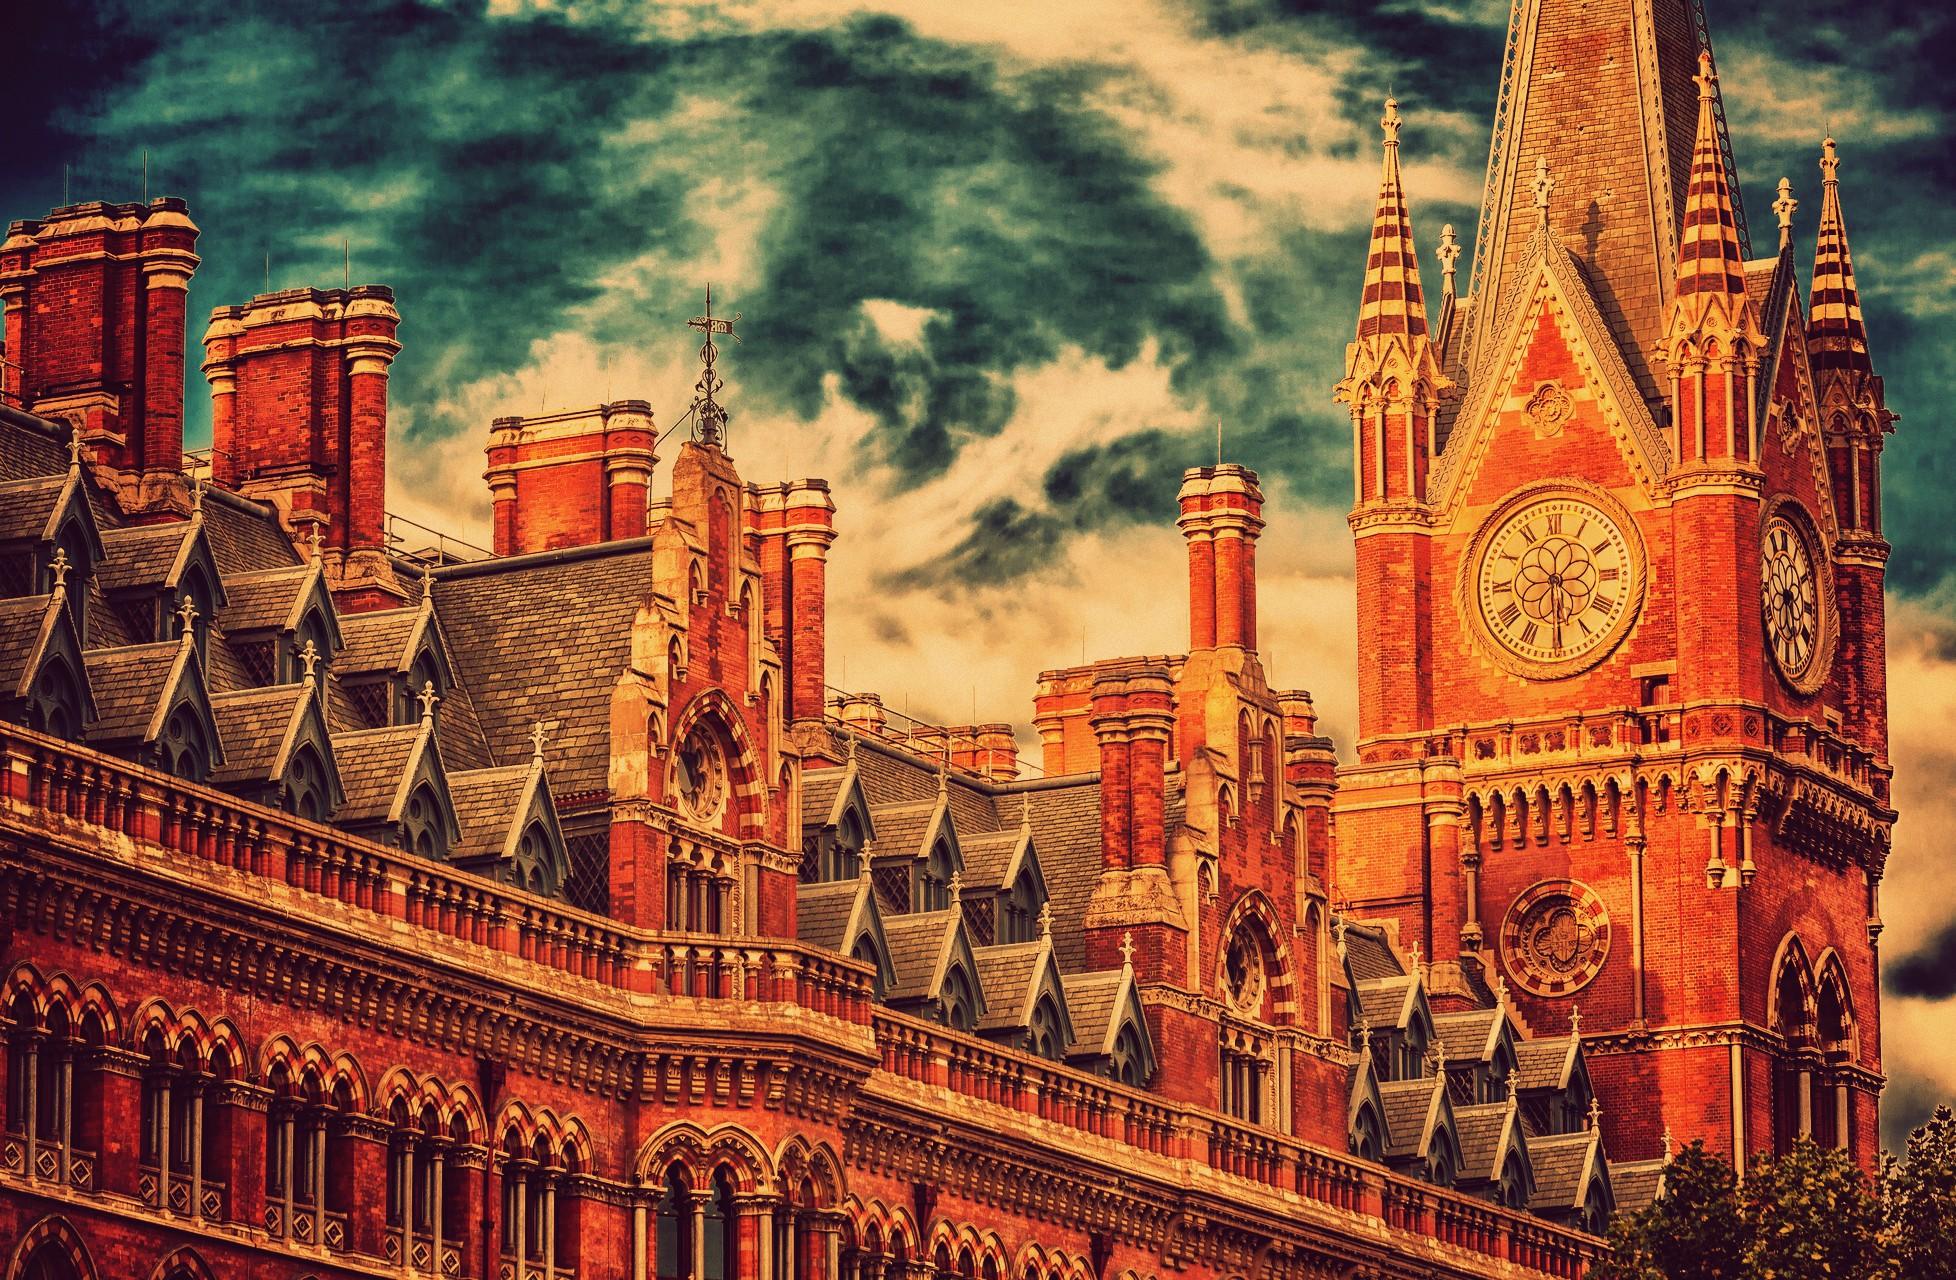 Architektur freetoedit london - London architektur ...